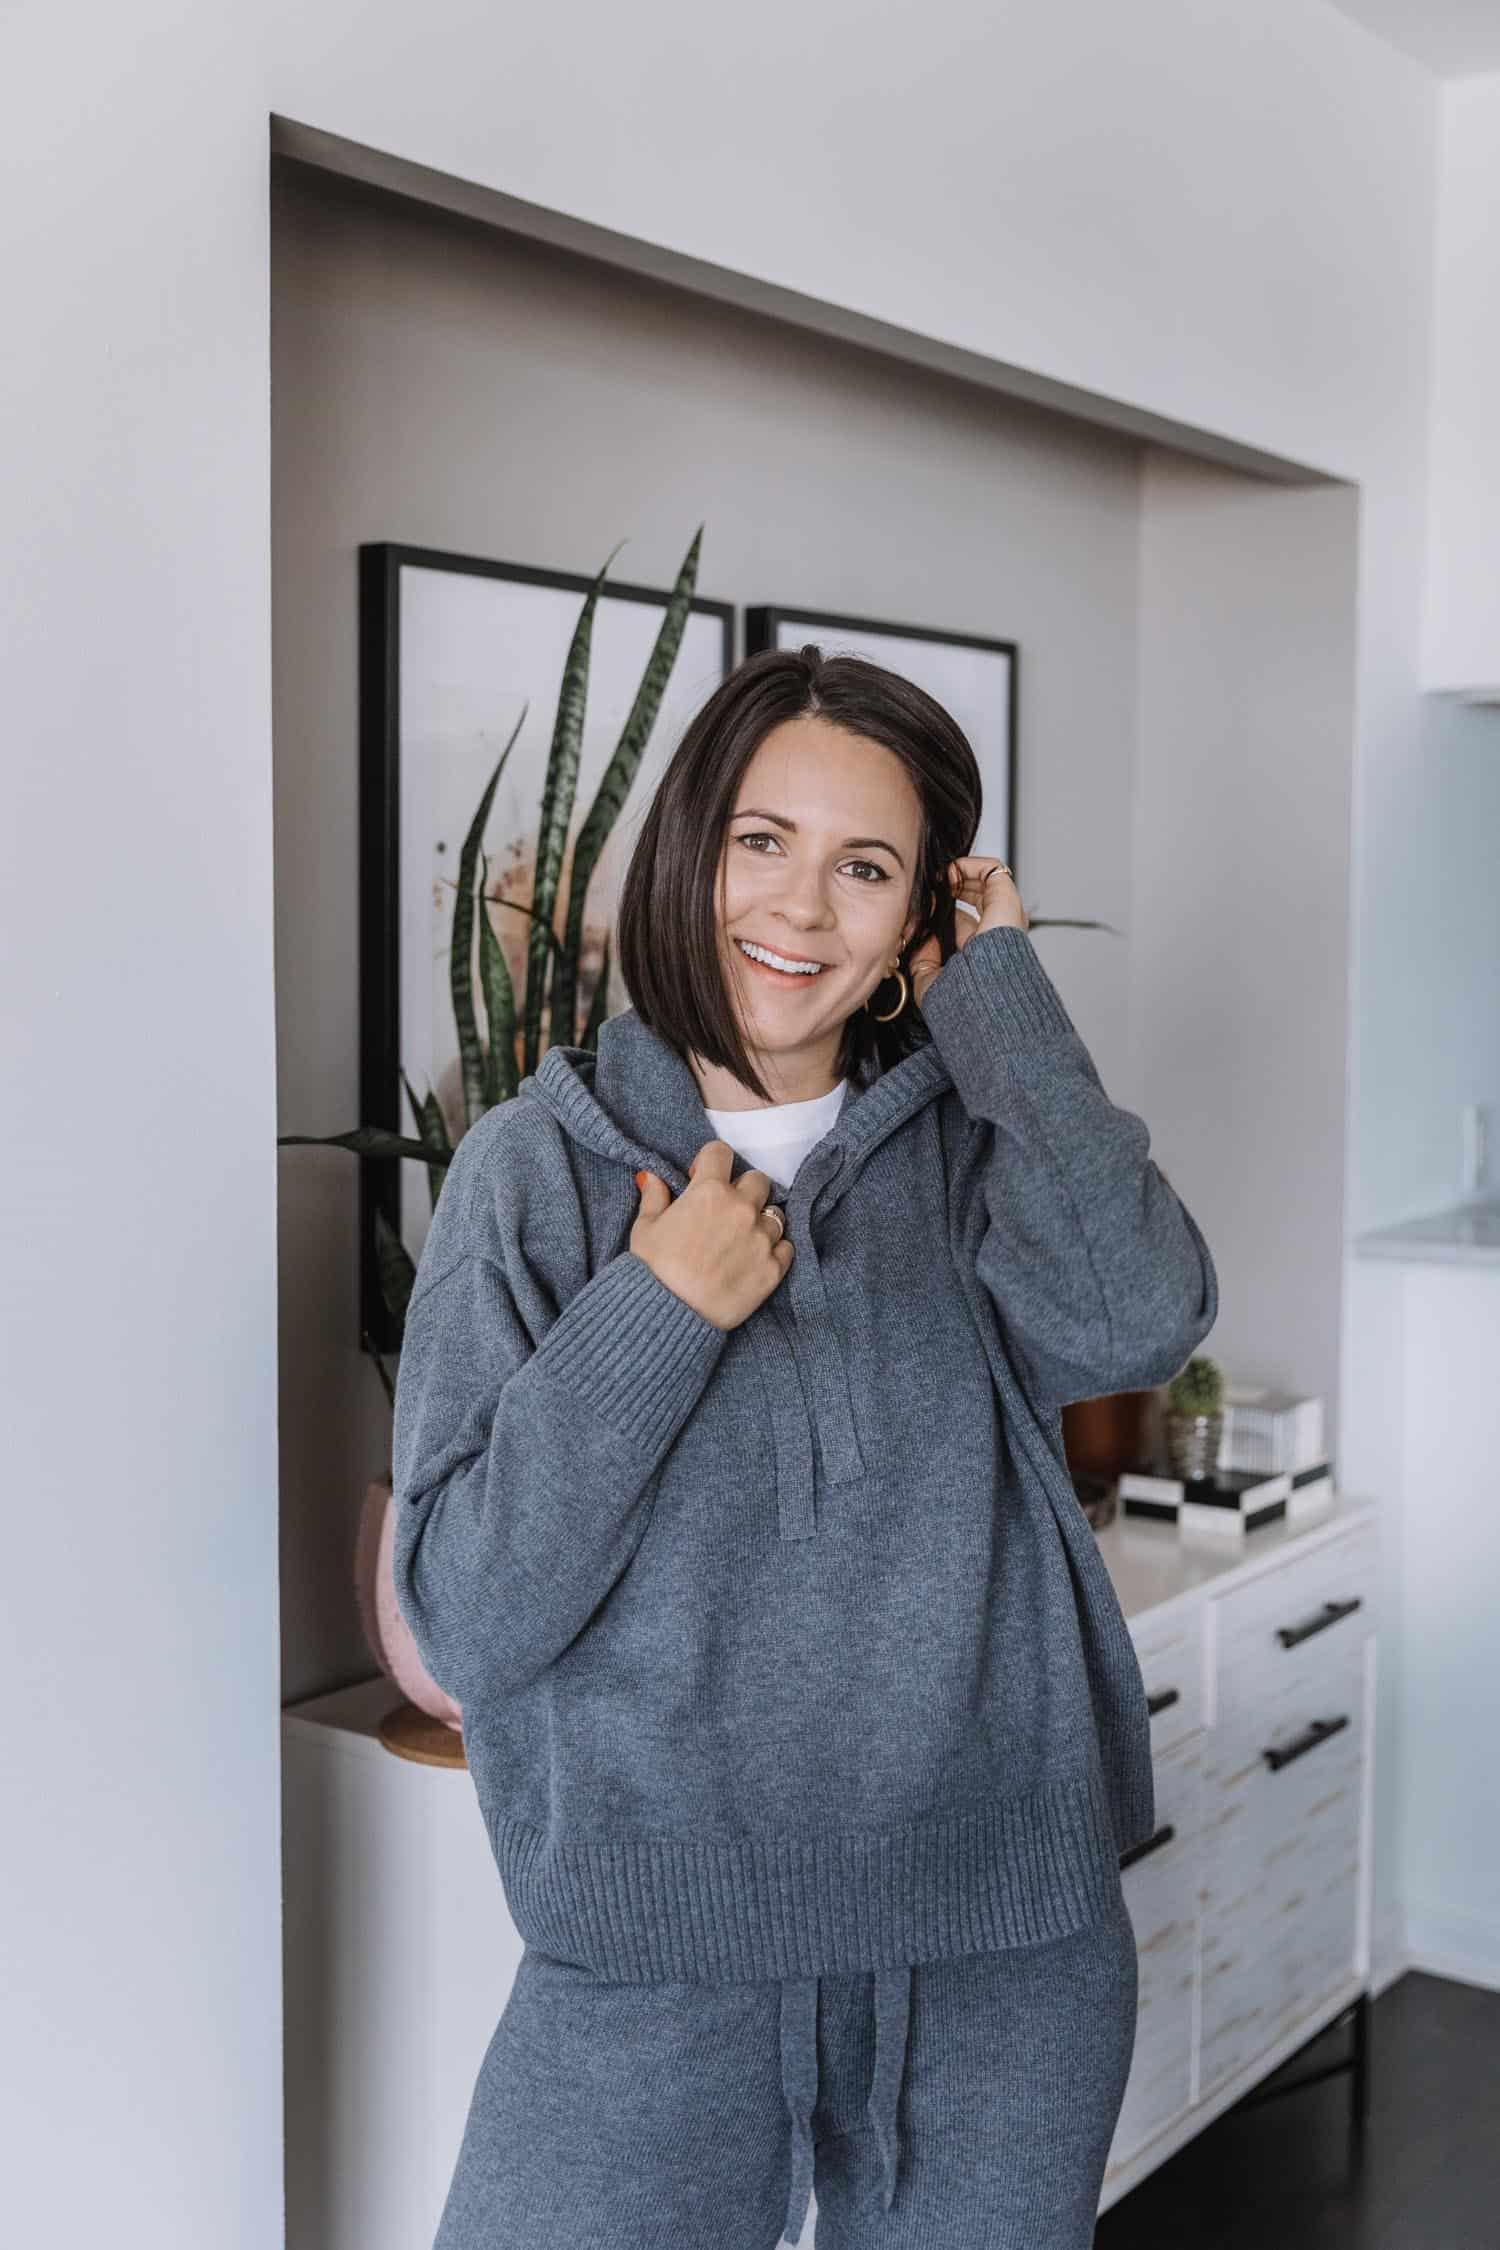 Jessica Camerata styles a grey sweatshirt hoodie